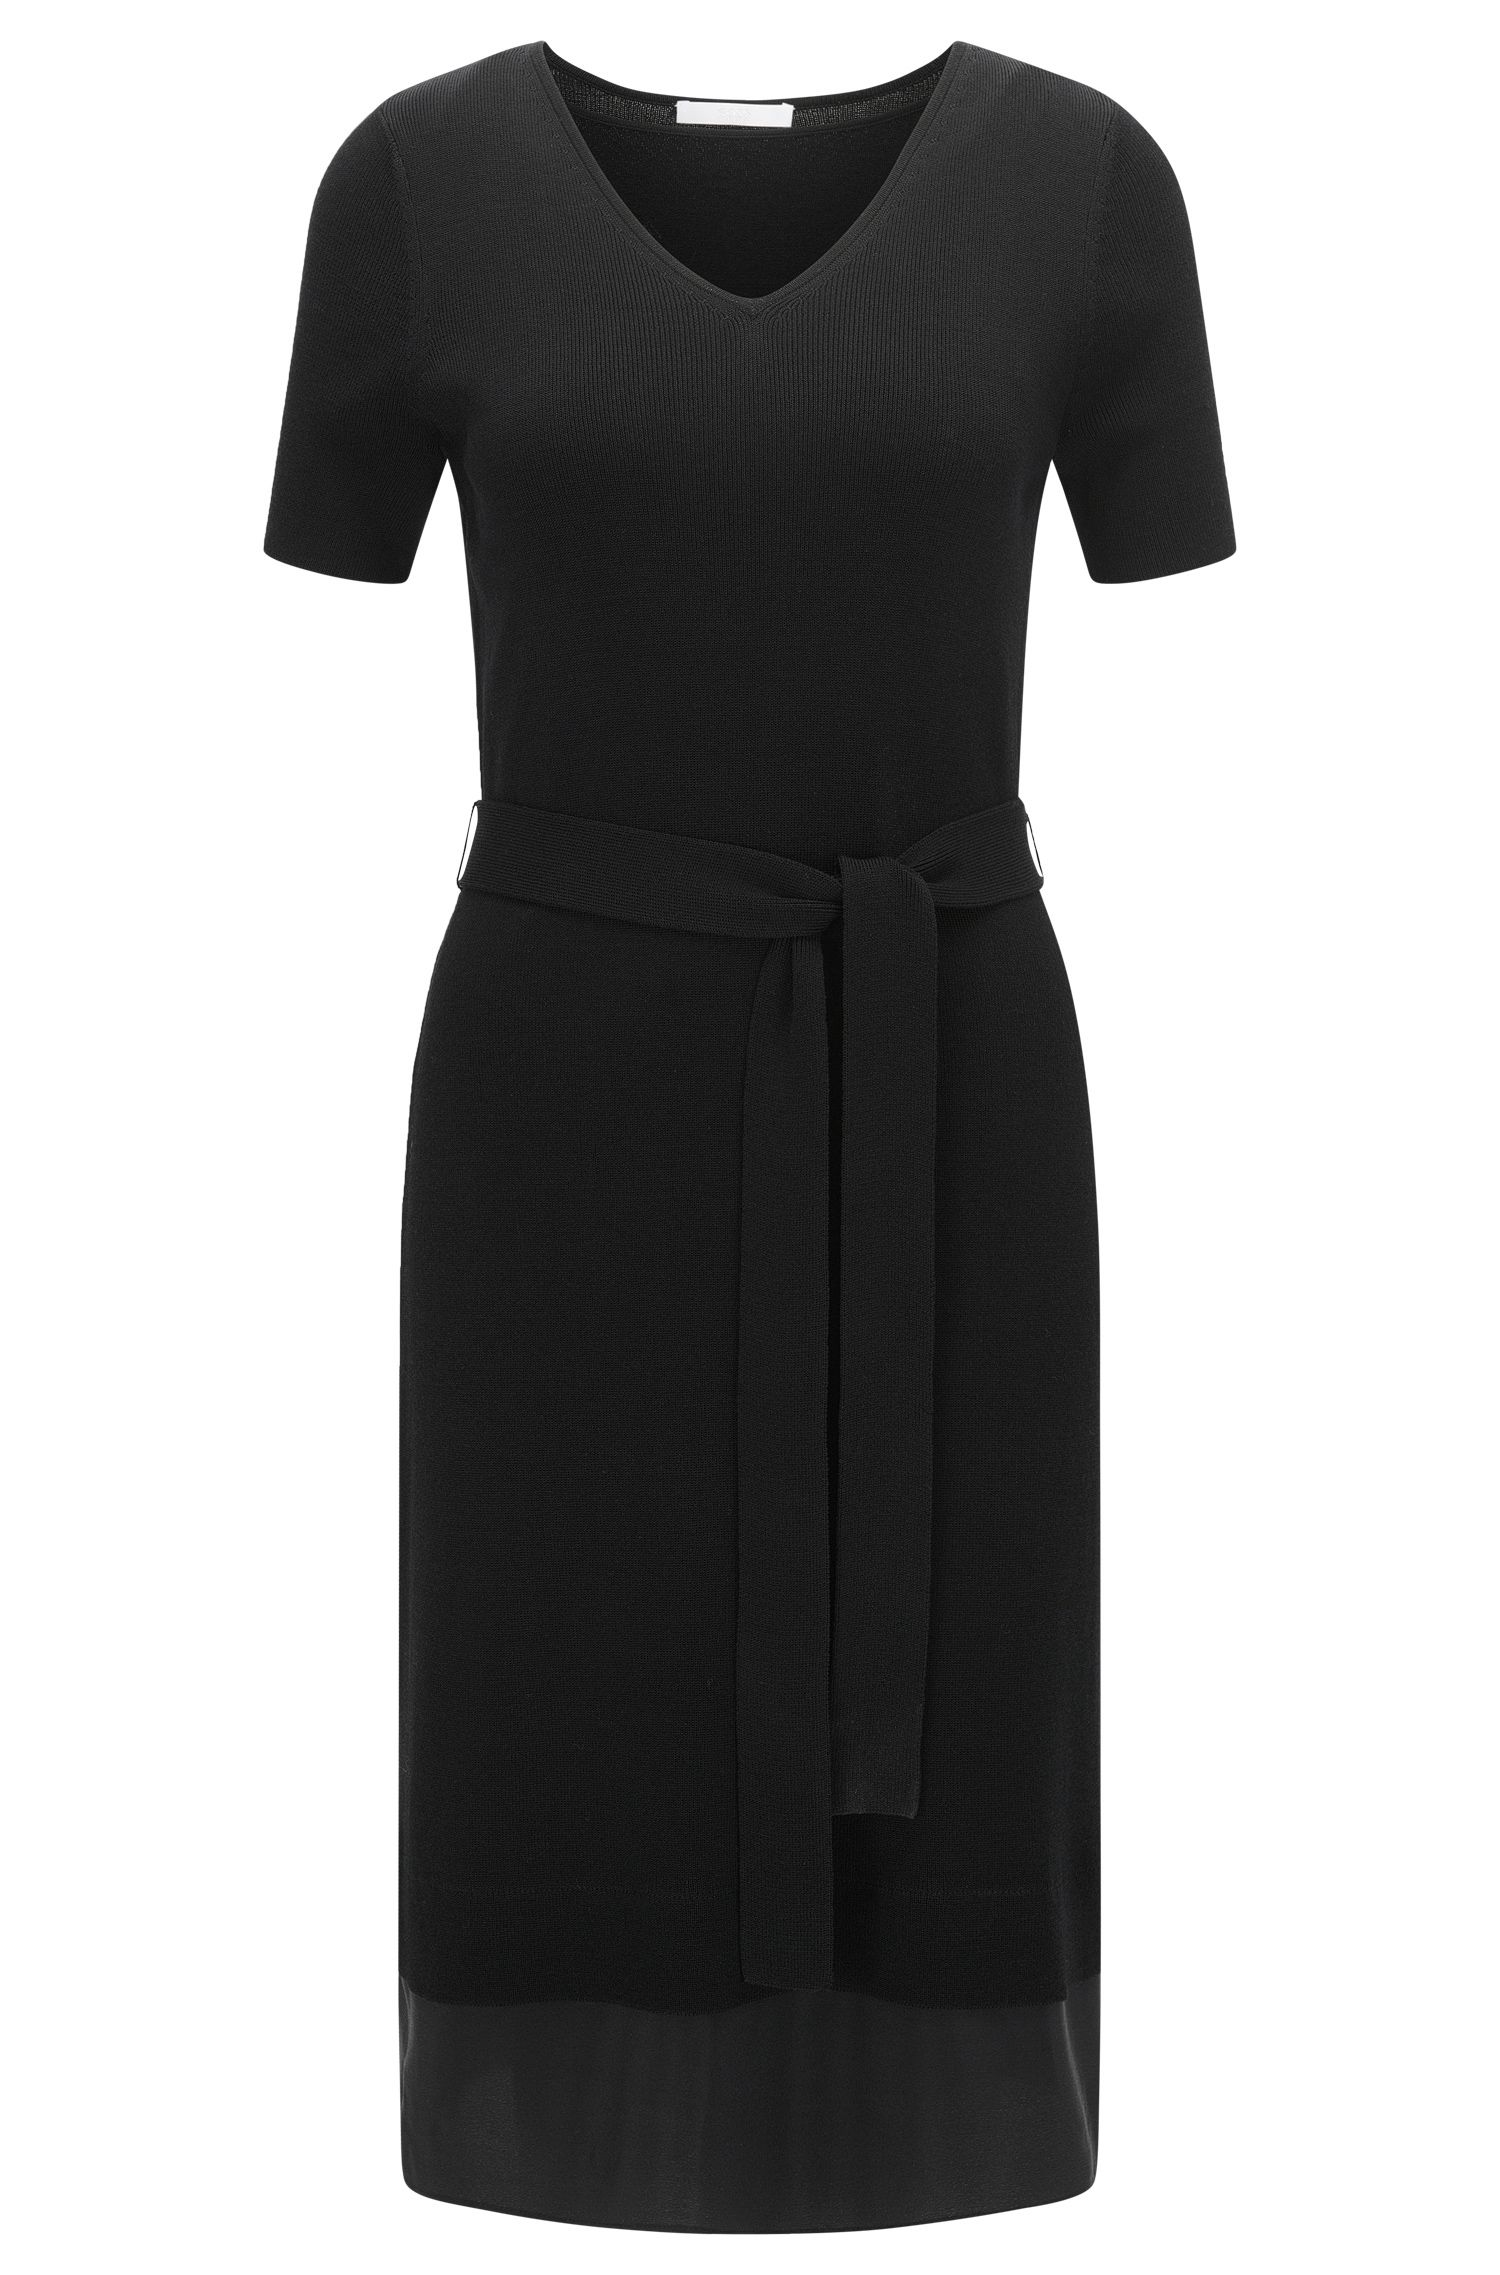 'Faia' | Stretch Cotton Knit Dress